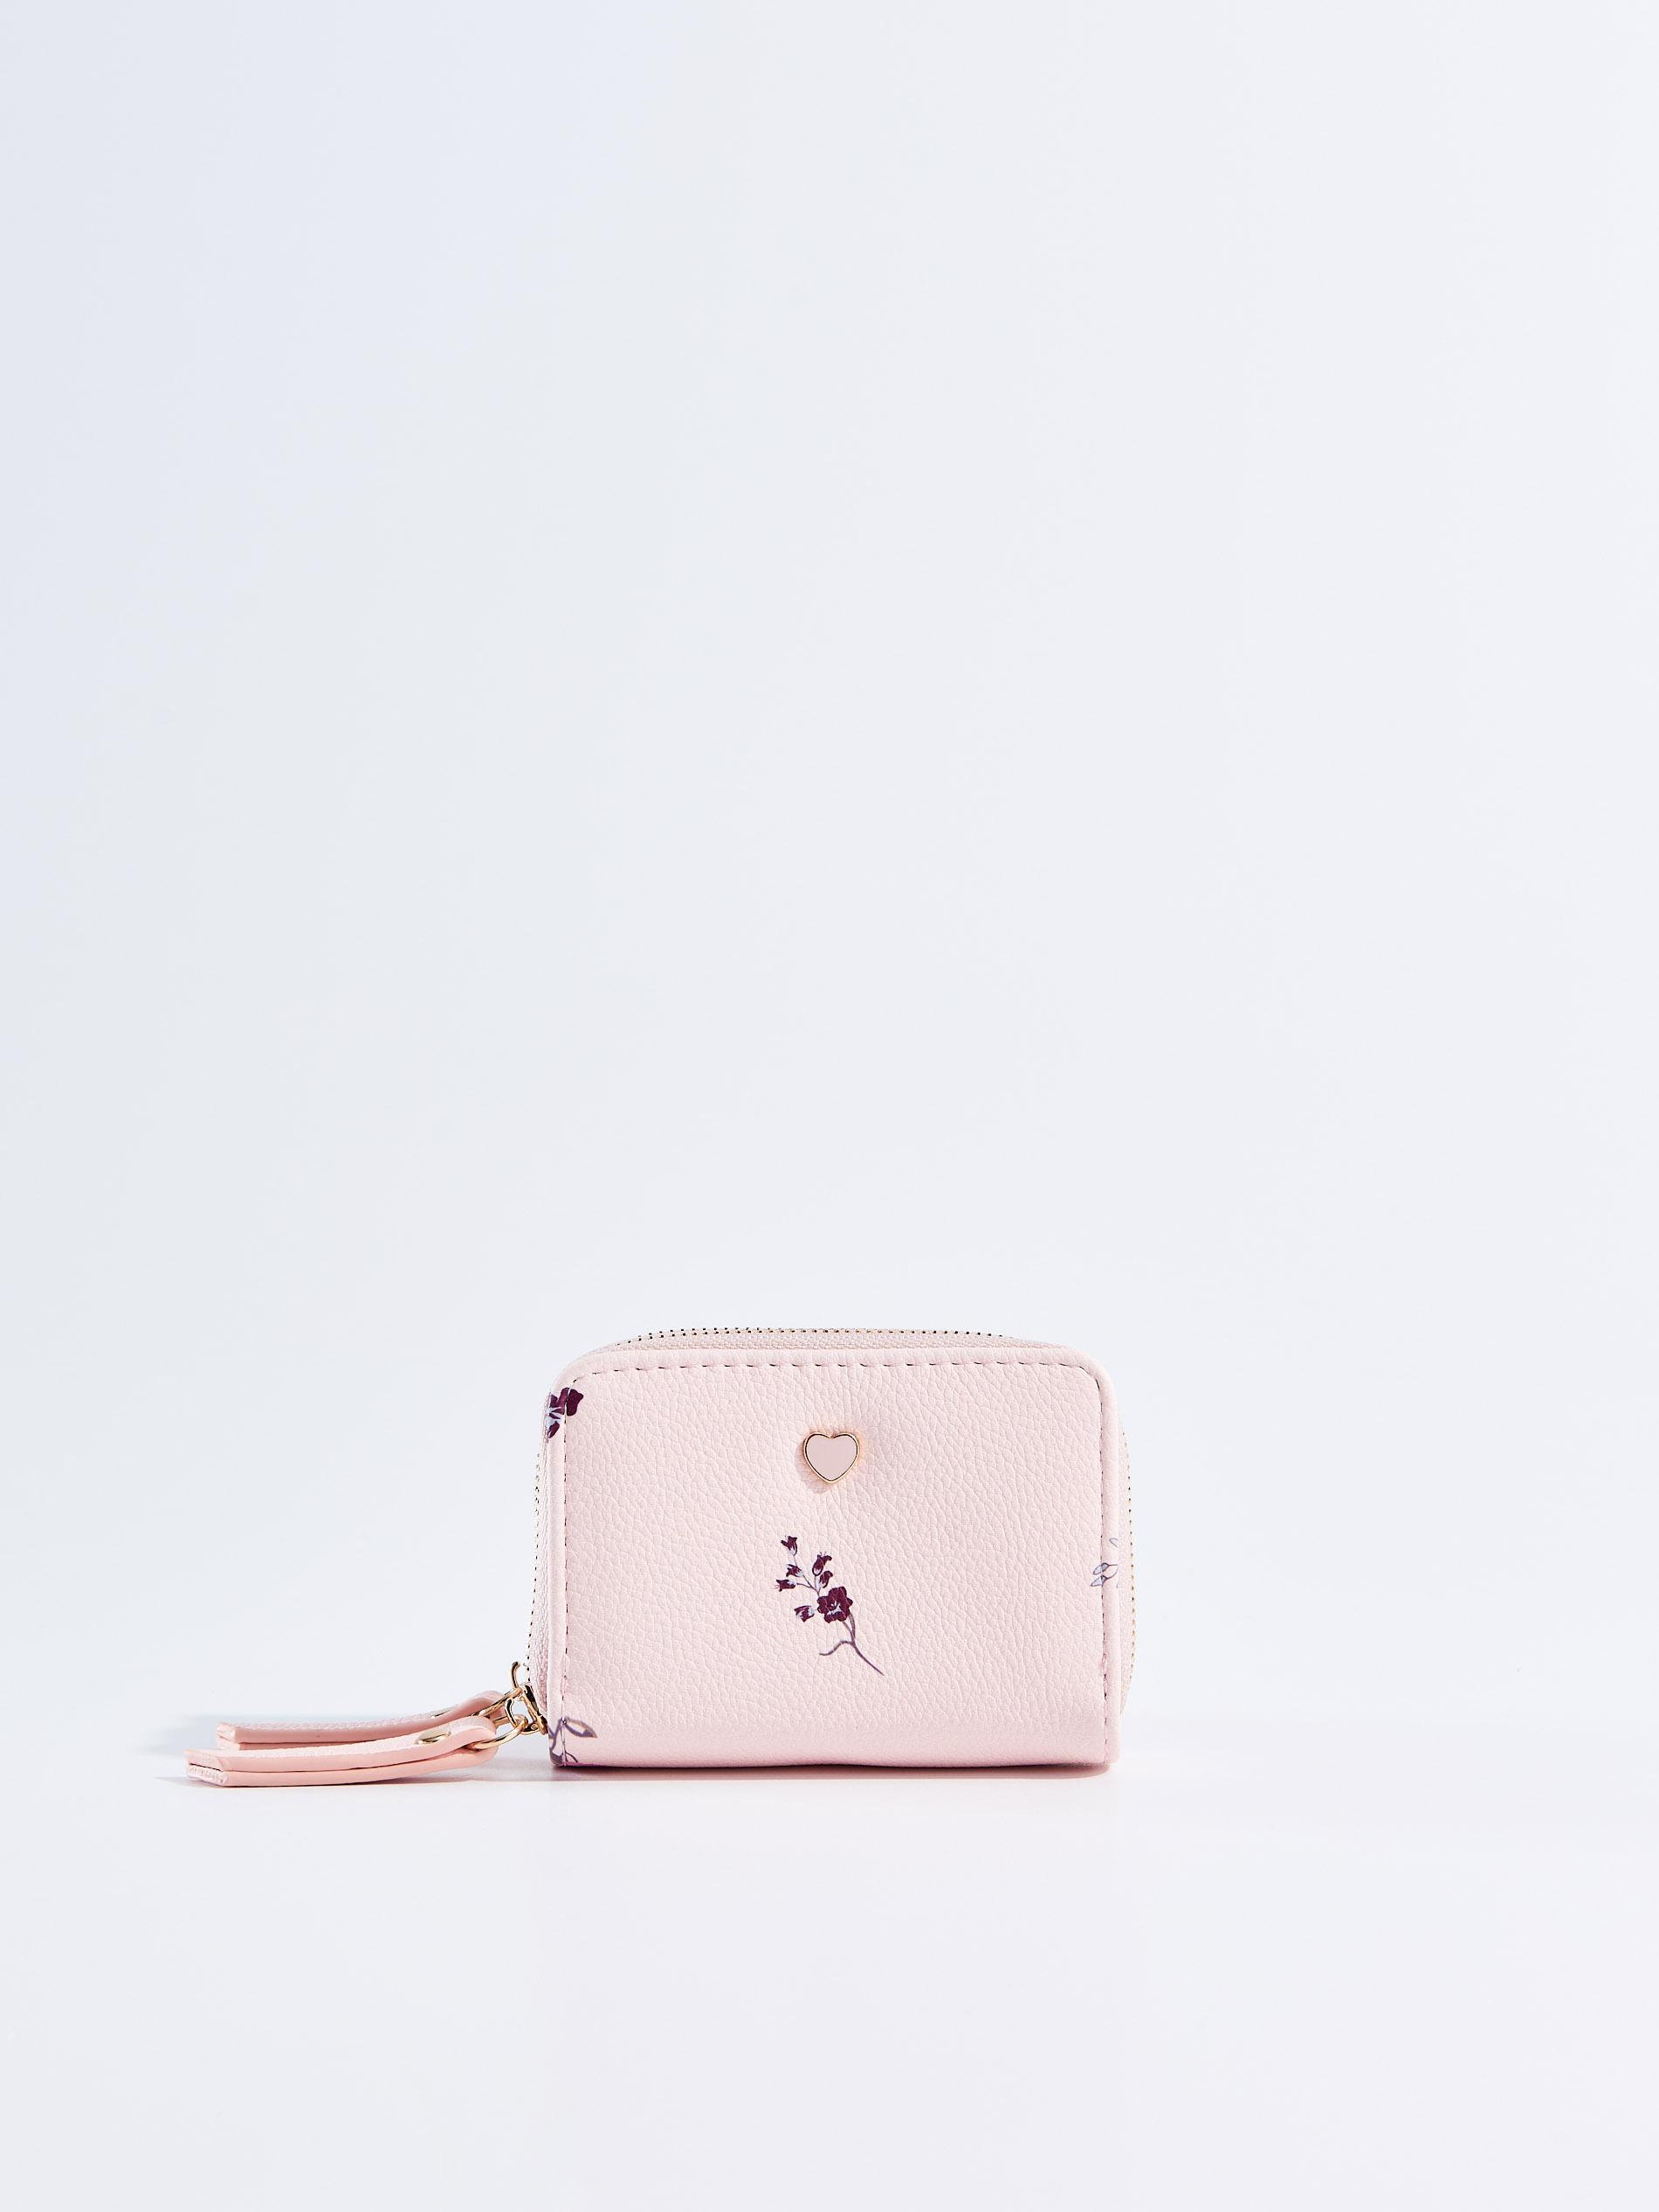 1900x2533 Wallet, Mohito, Sy915 Mlc